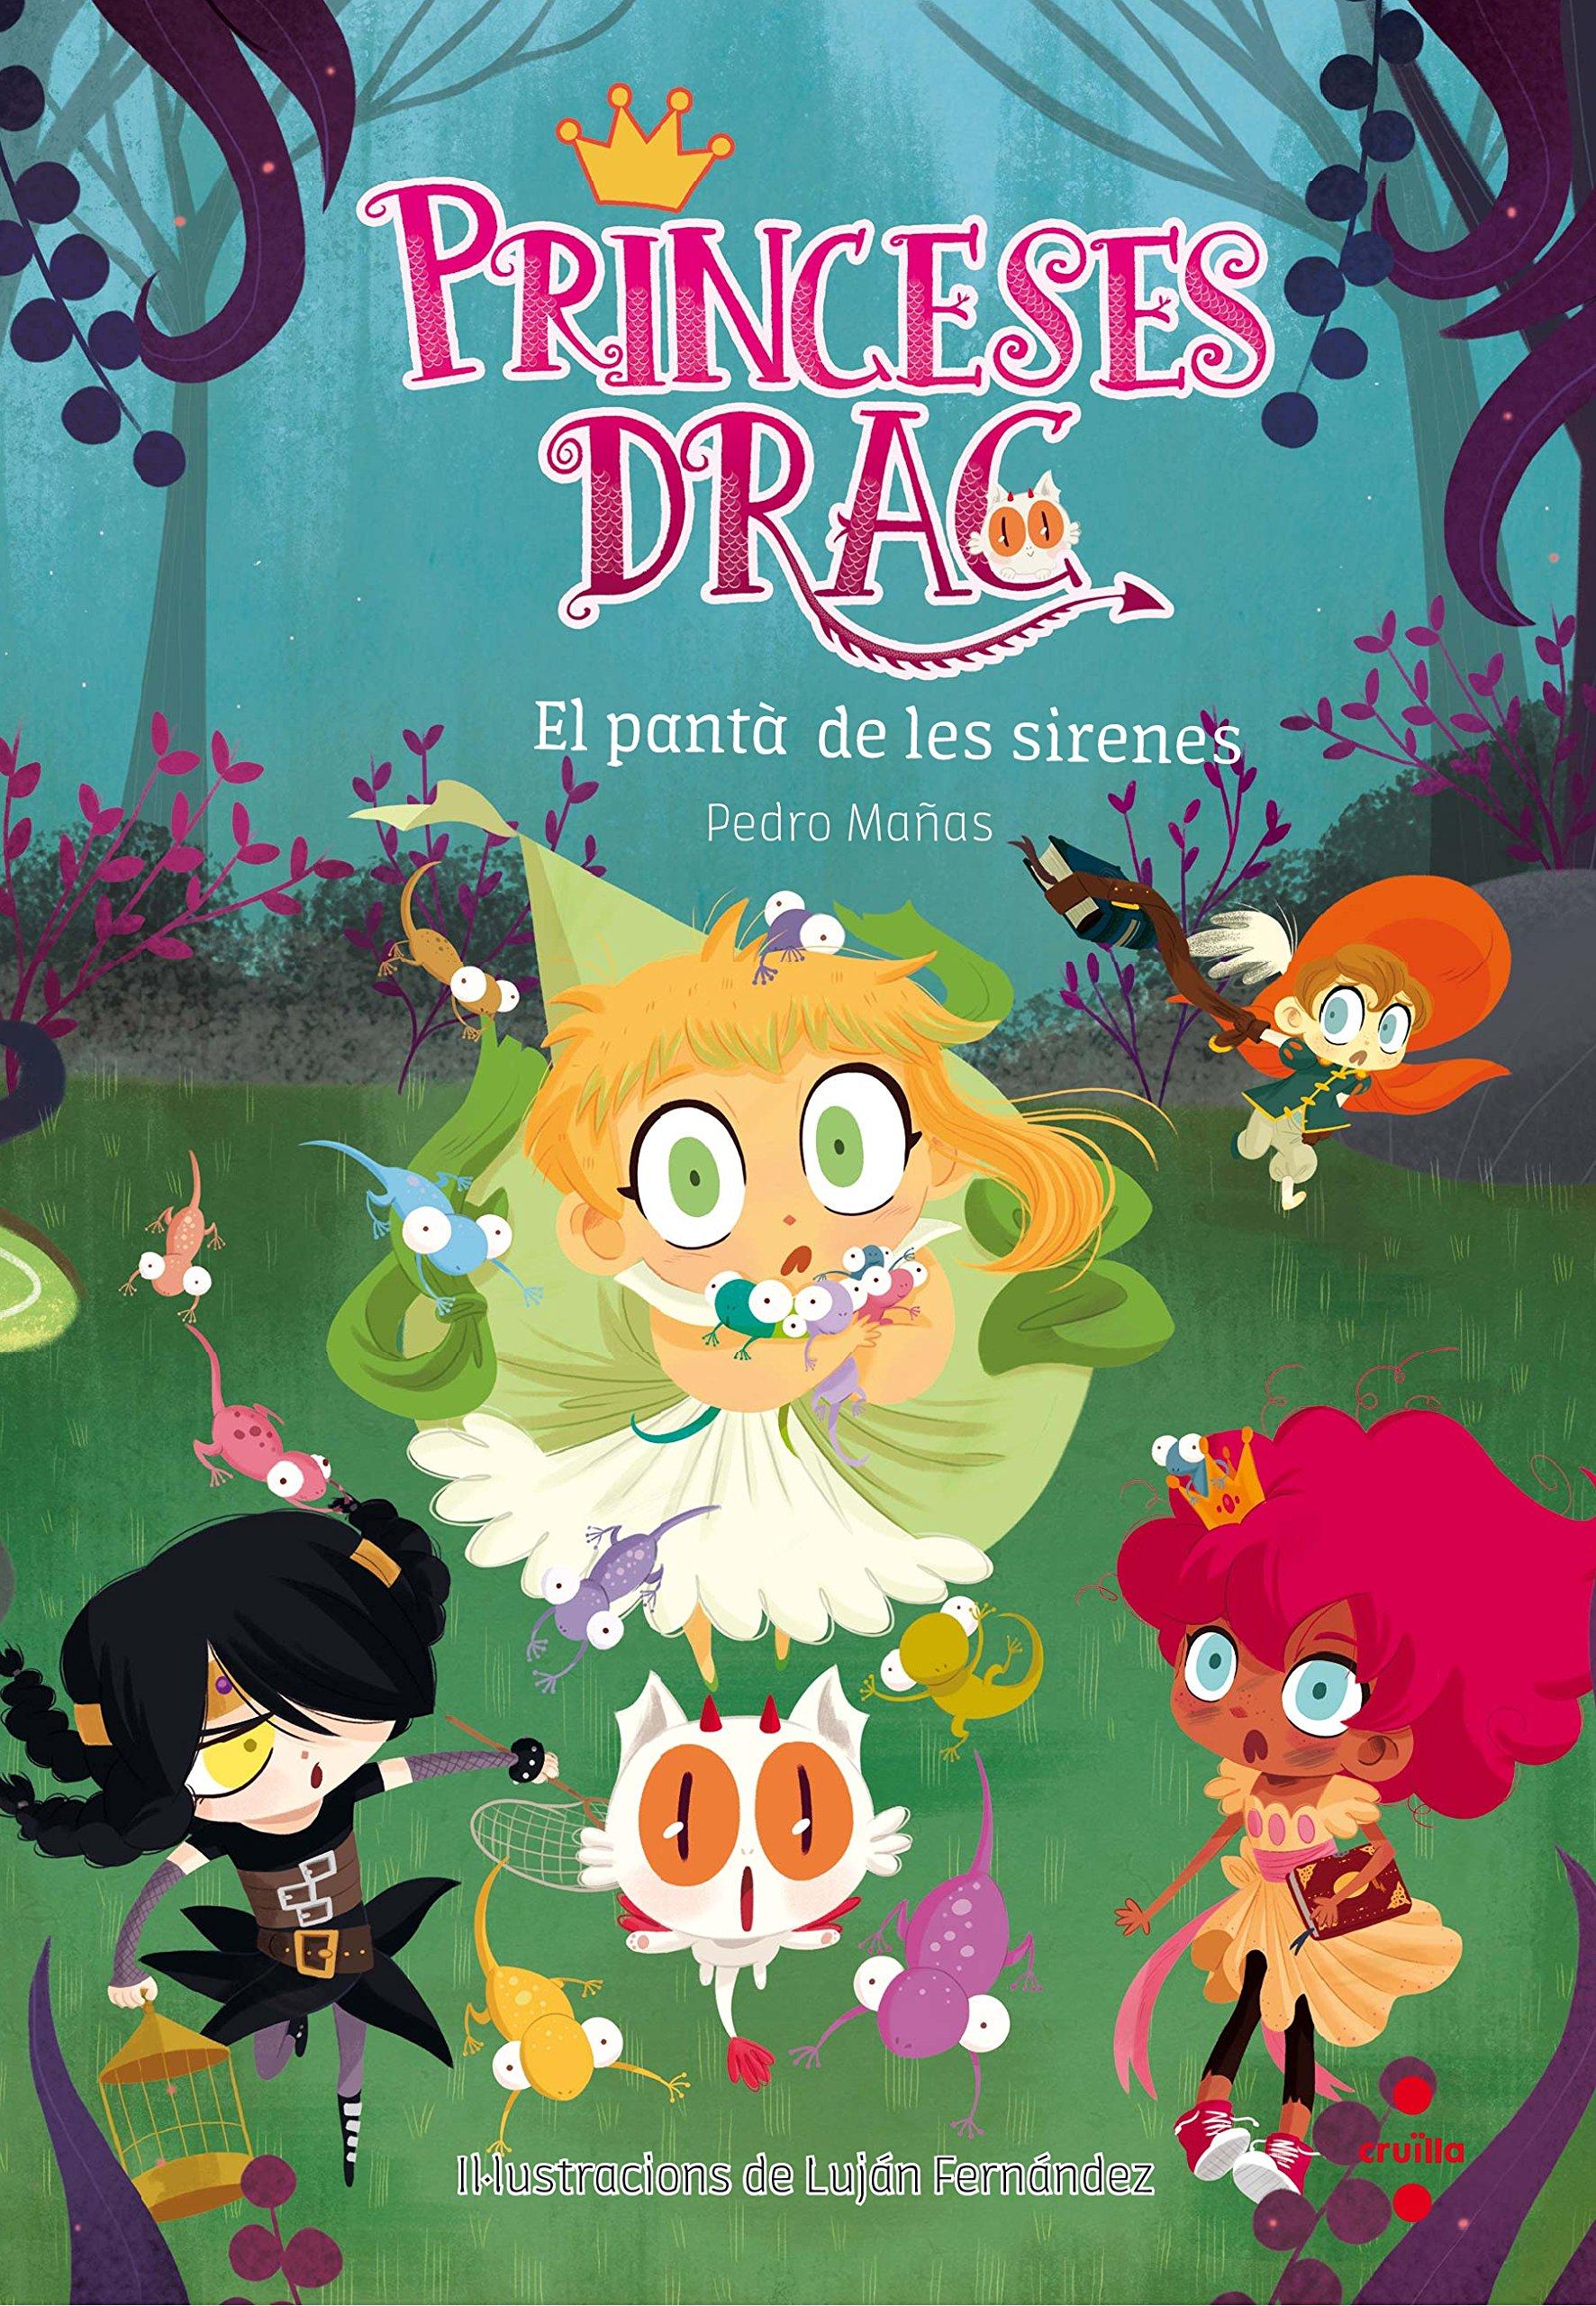 Princeses Drac 2: El pantà de les sirenes (Princesas Dragón)